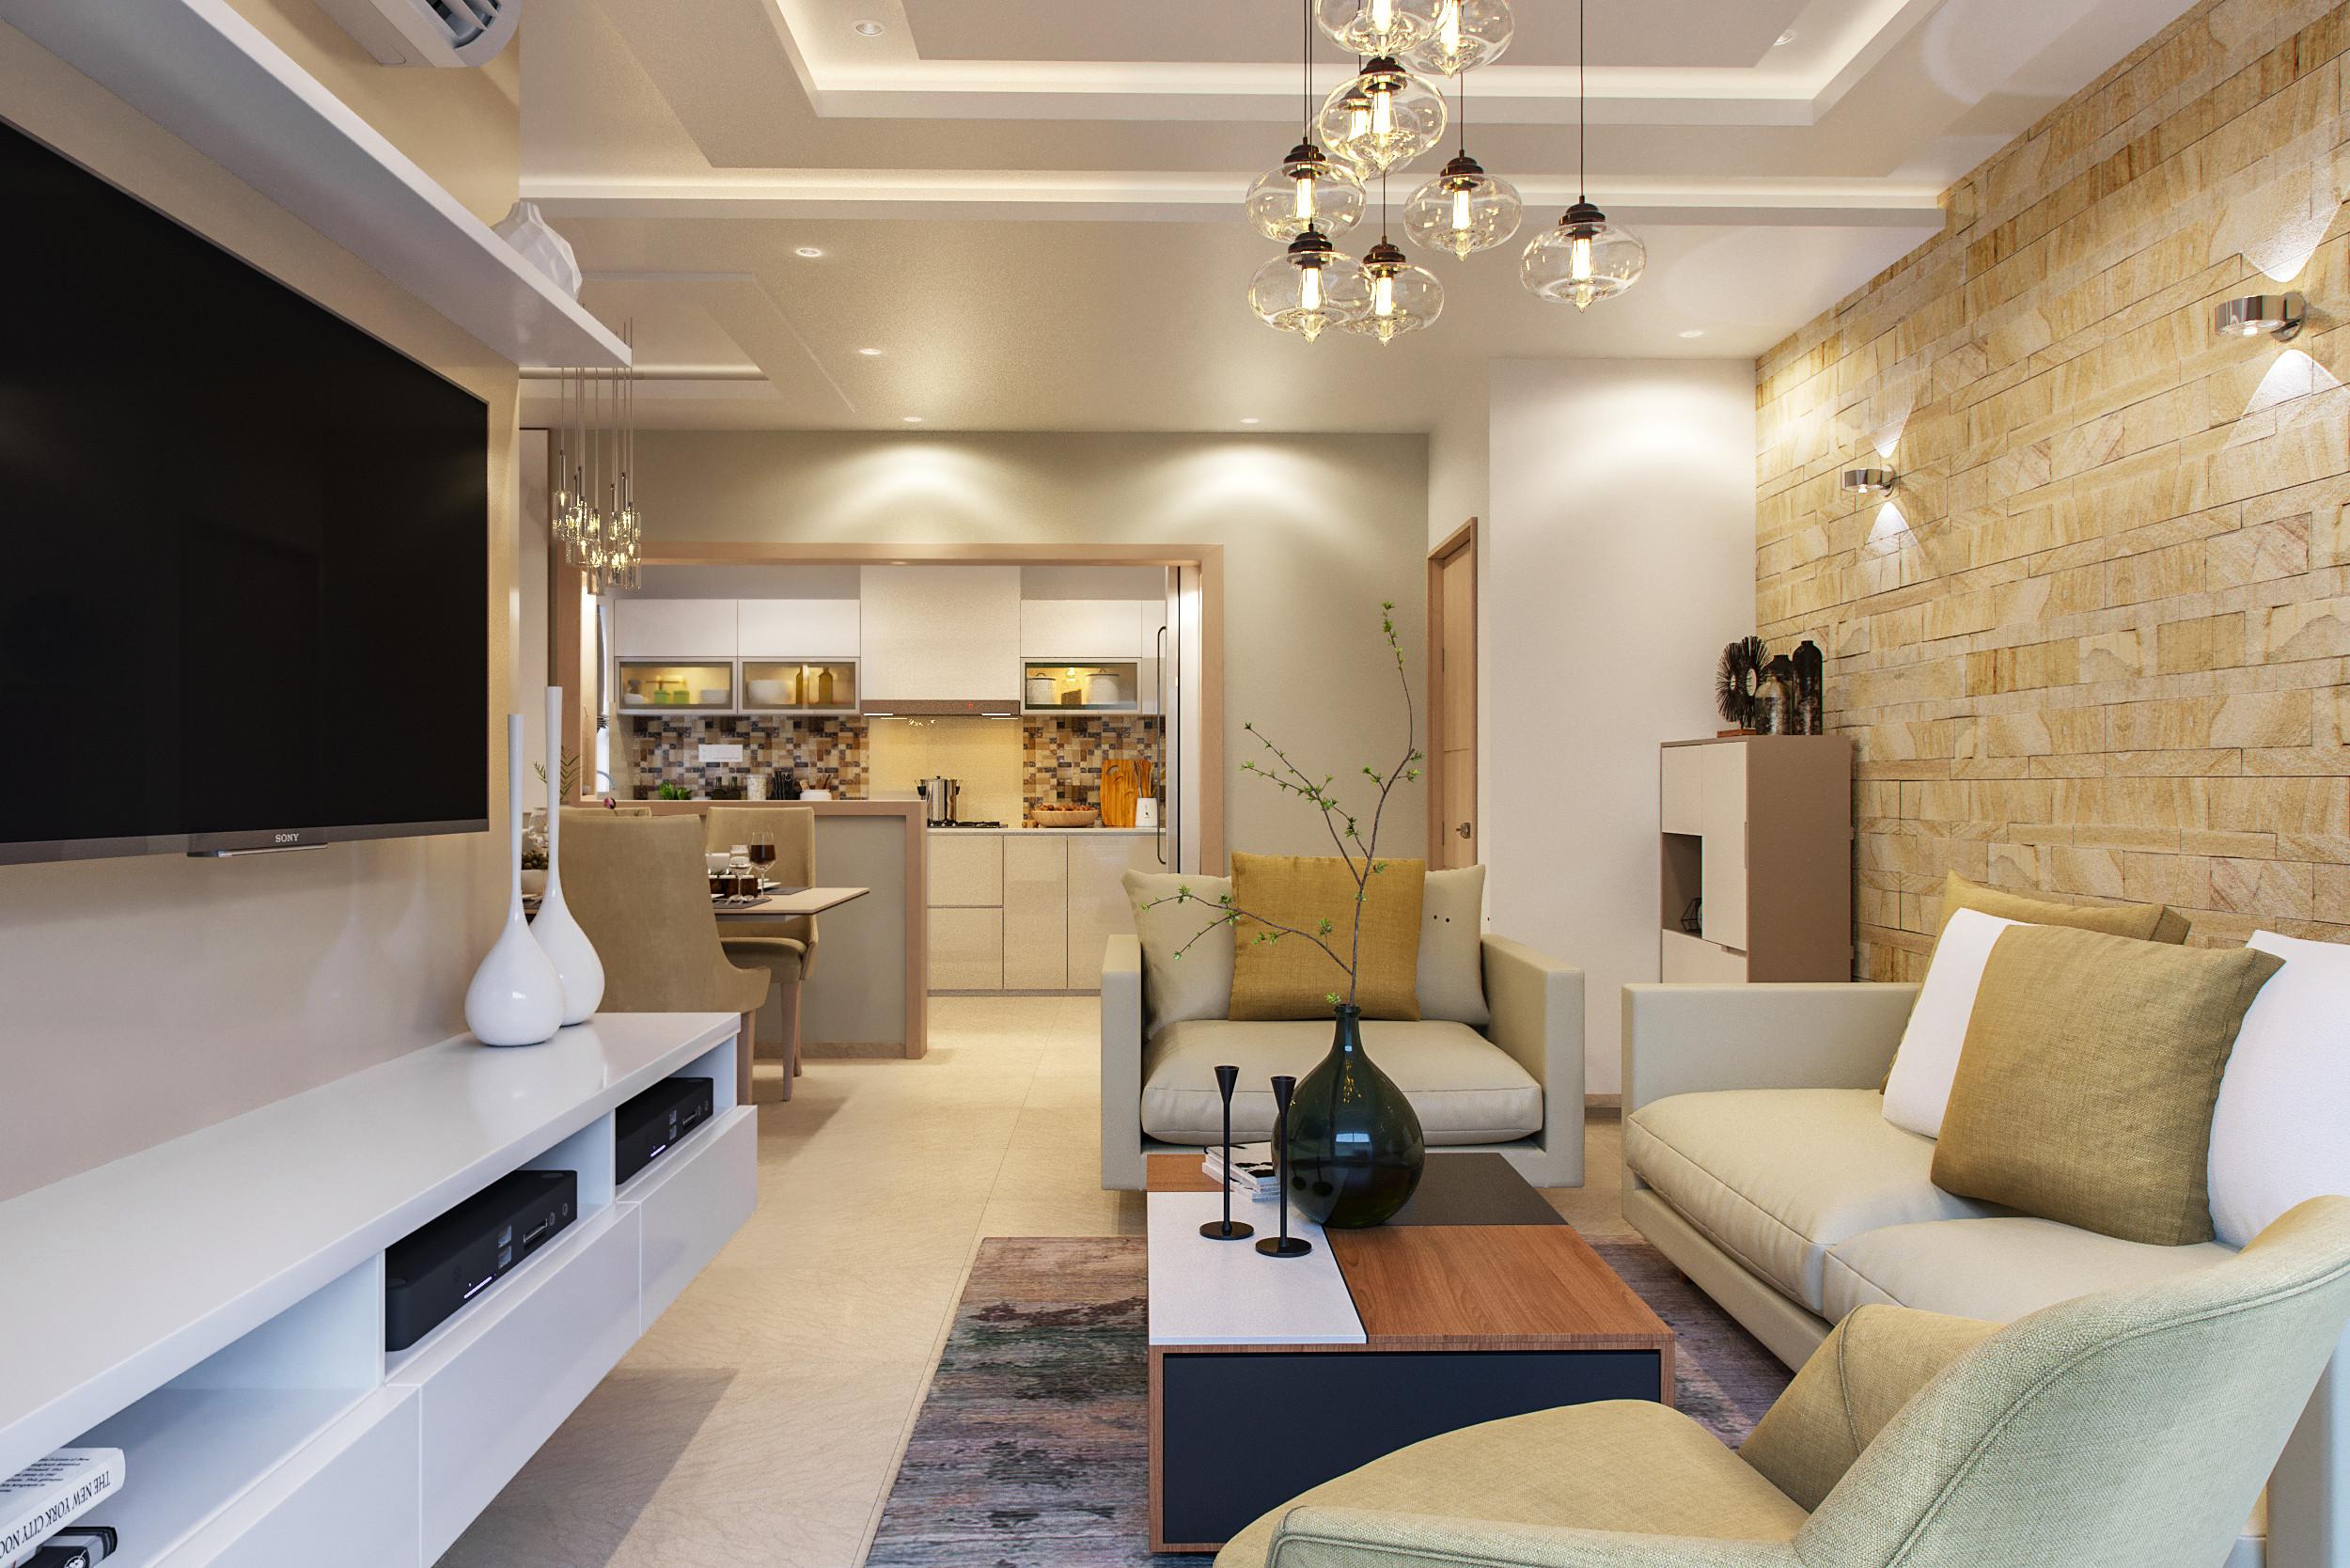 75 Beautiful Wallpaper Living Room Pictures Ideas December 2020 Houzz